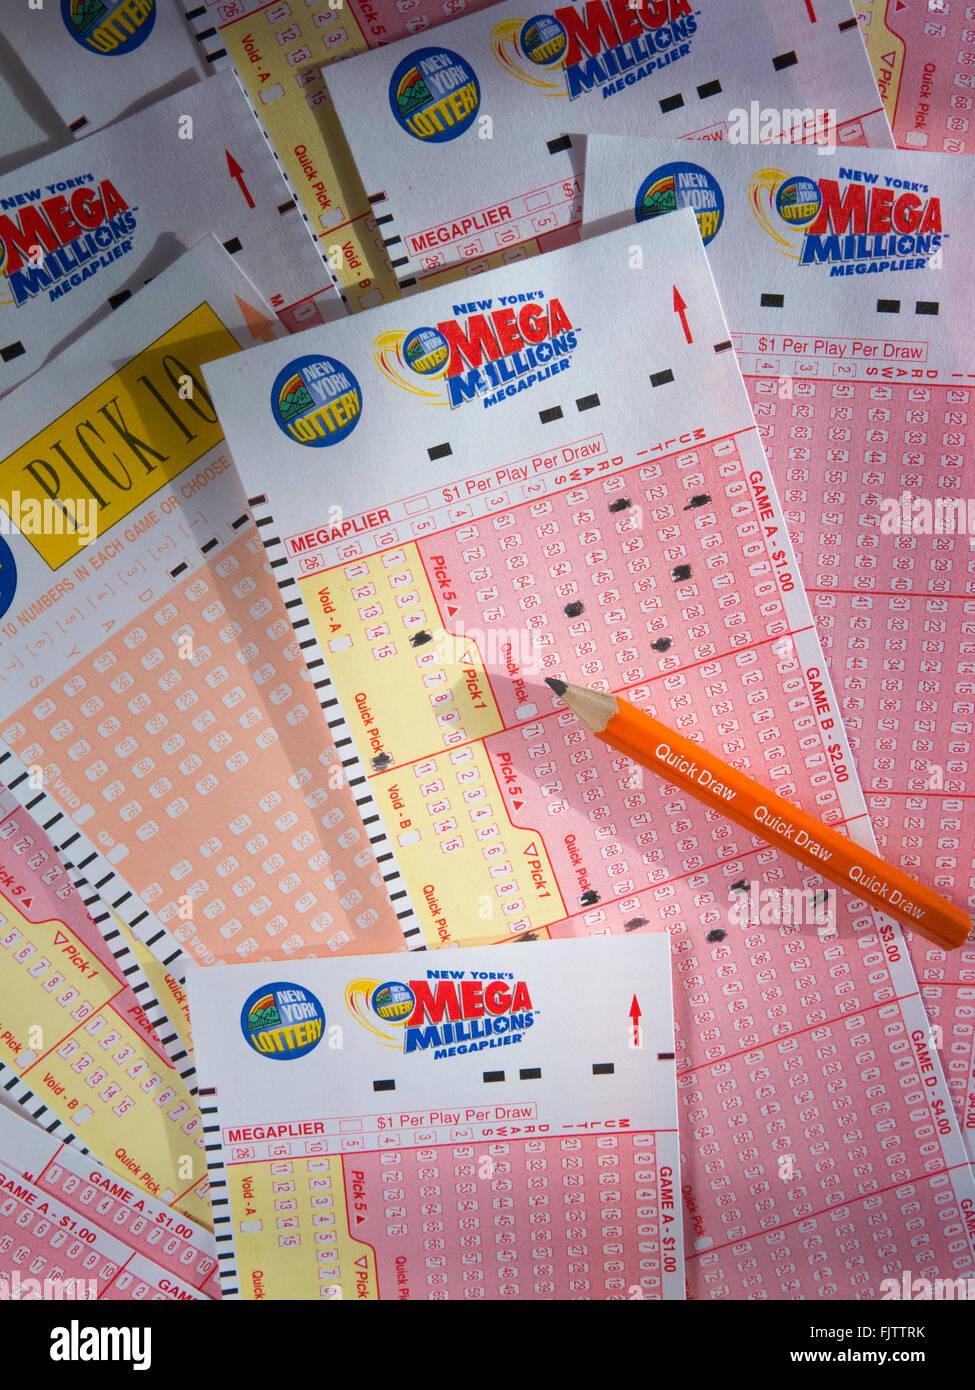 New York Lottery Mega Millions Playcard Still Life Usa Stock Photo Alamy